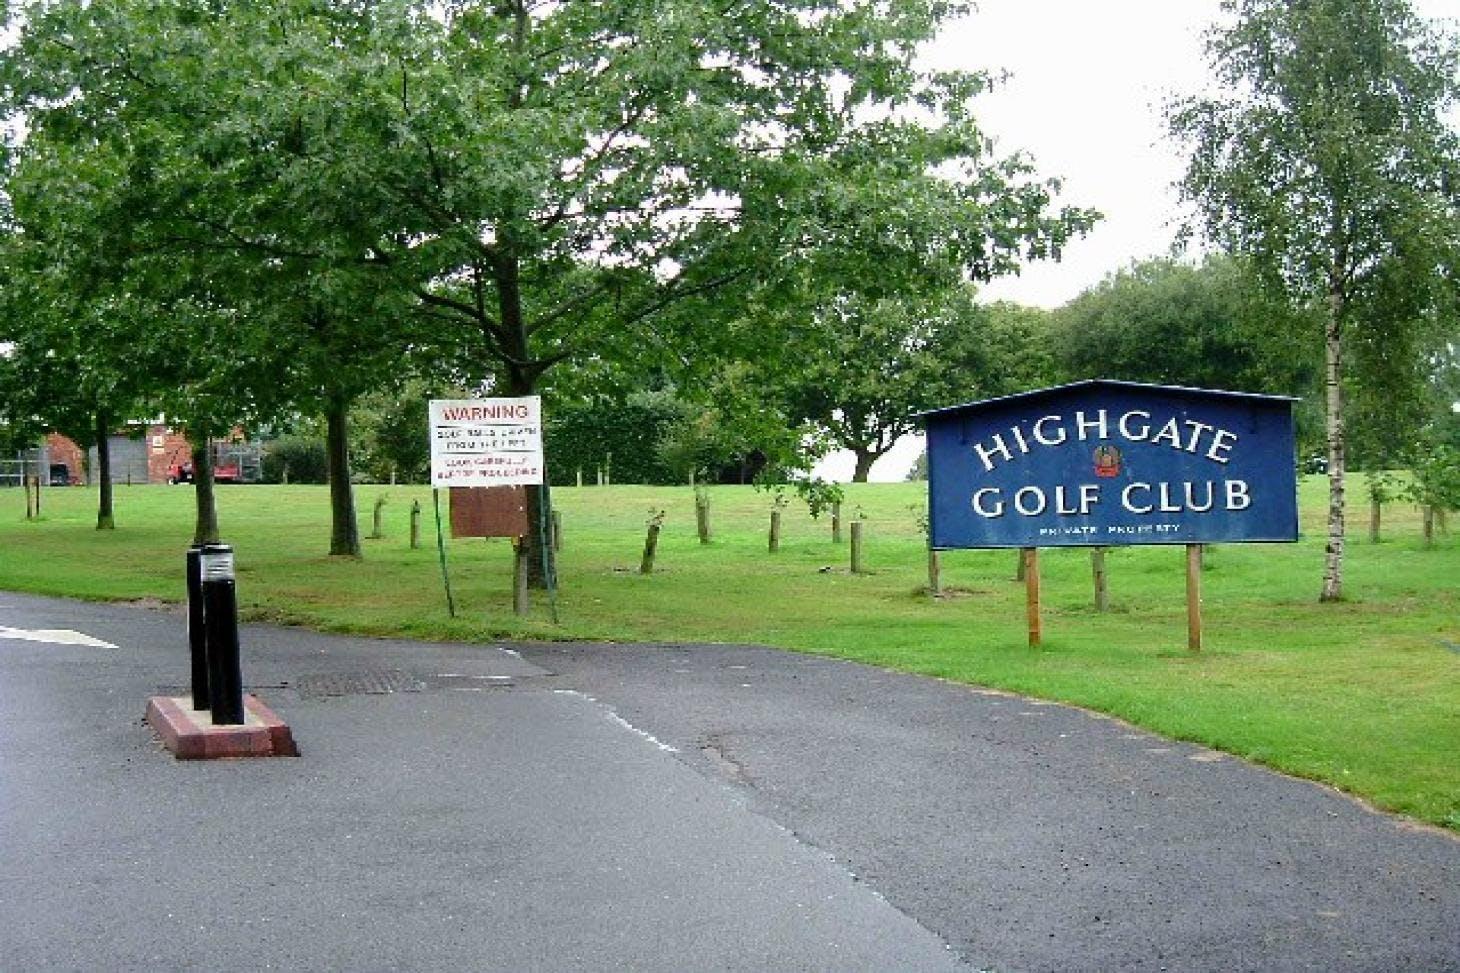 Highgate Golf Club 18 hole golf course